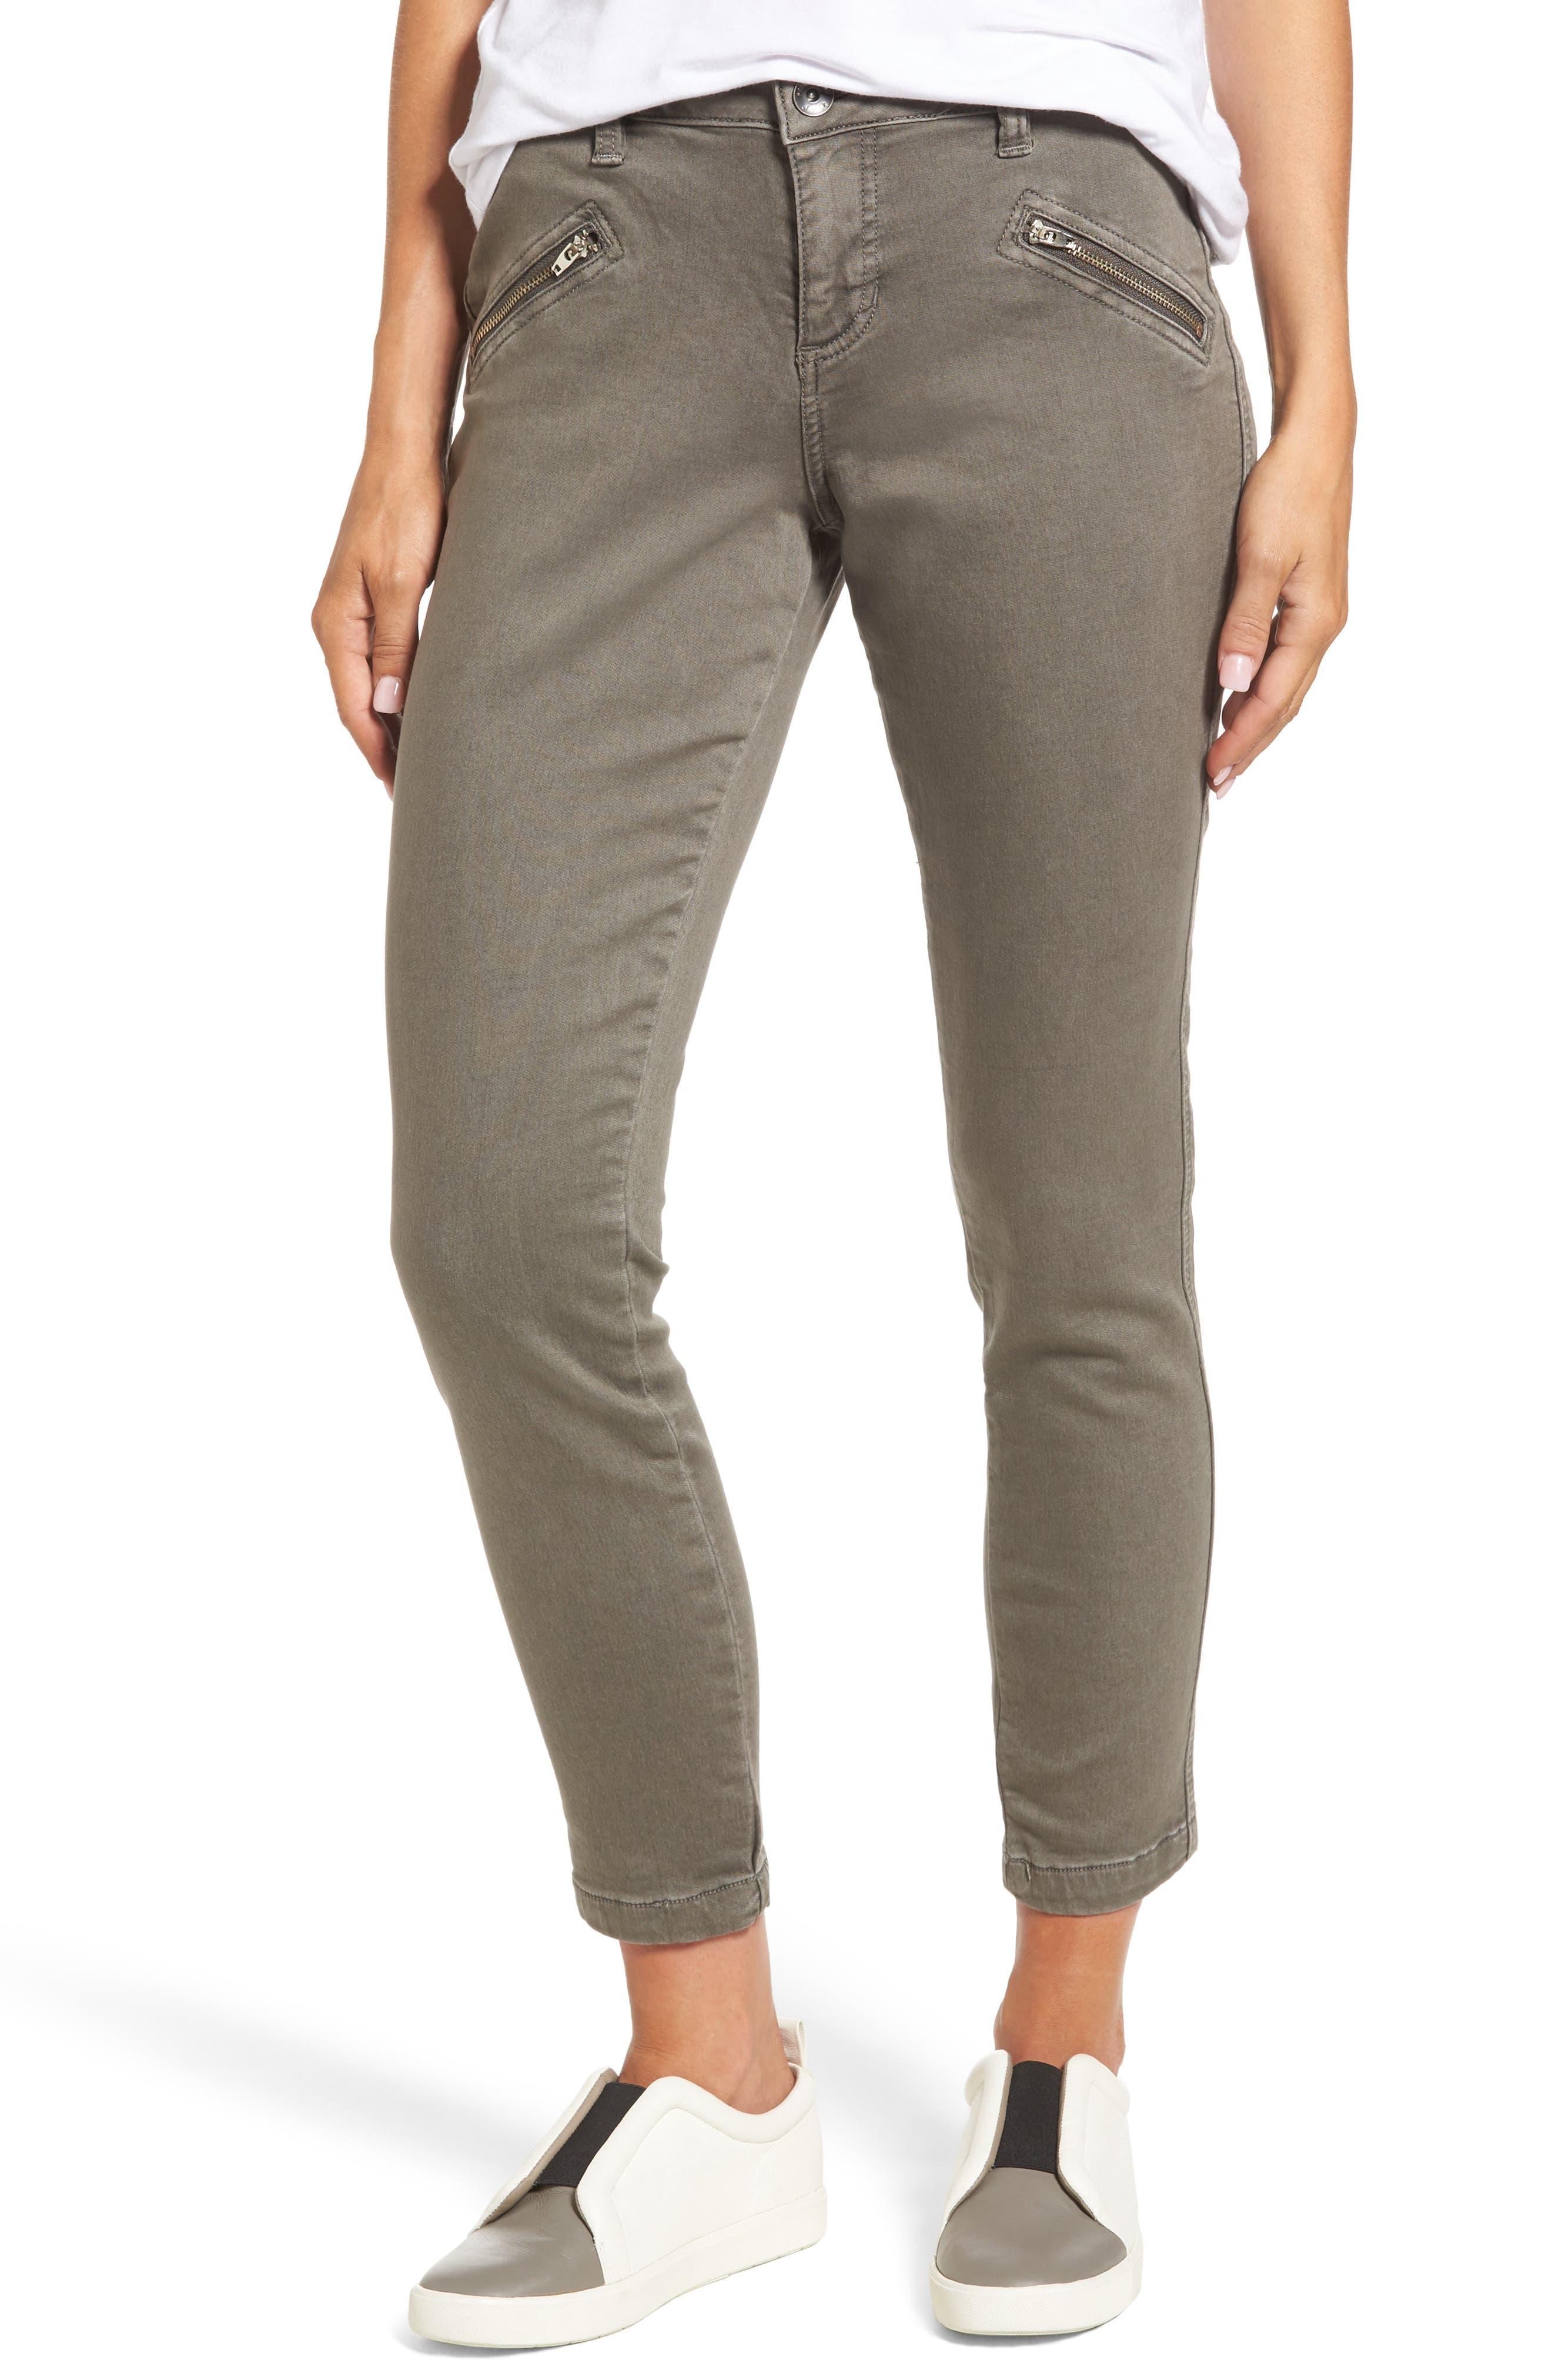 Ryan Knit Skinny Jeans,                             Main thumbnail 1, color,                             205